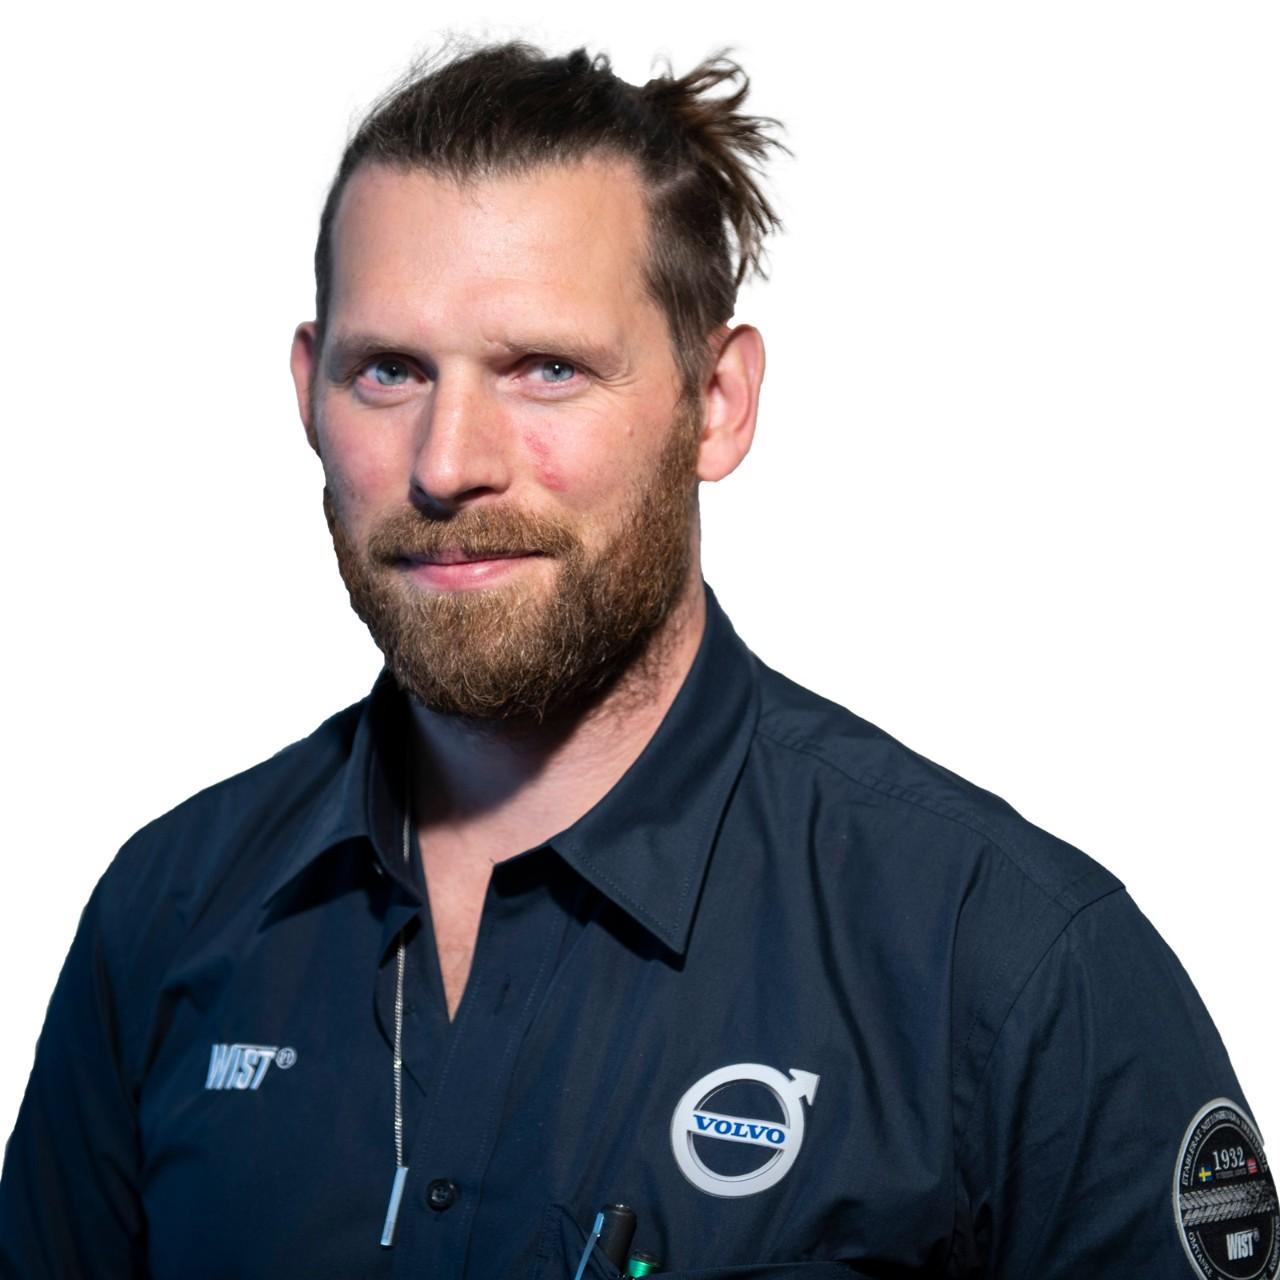 Daniel Lundberg